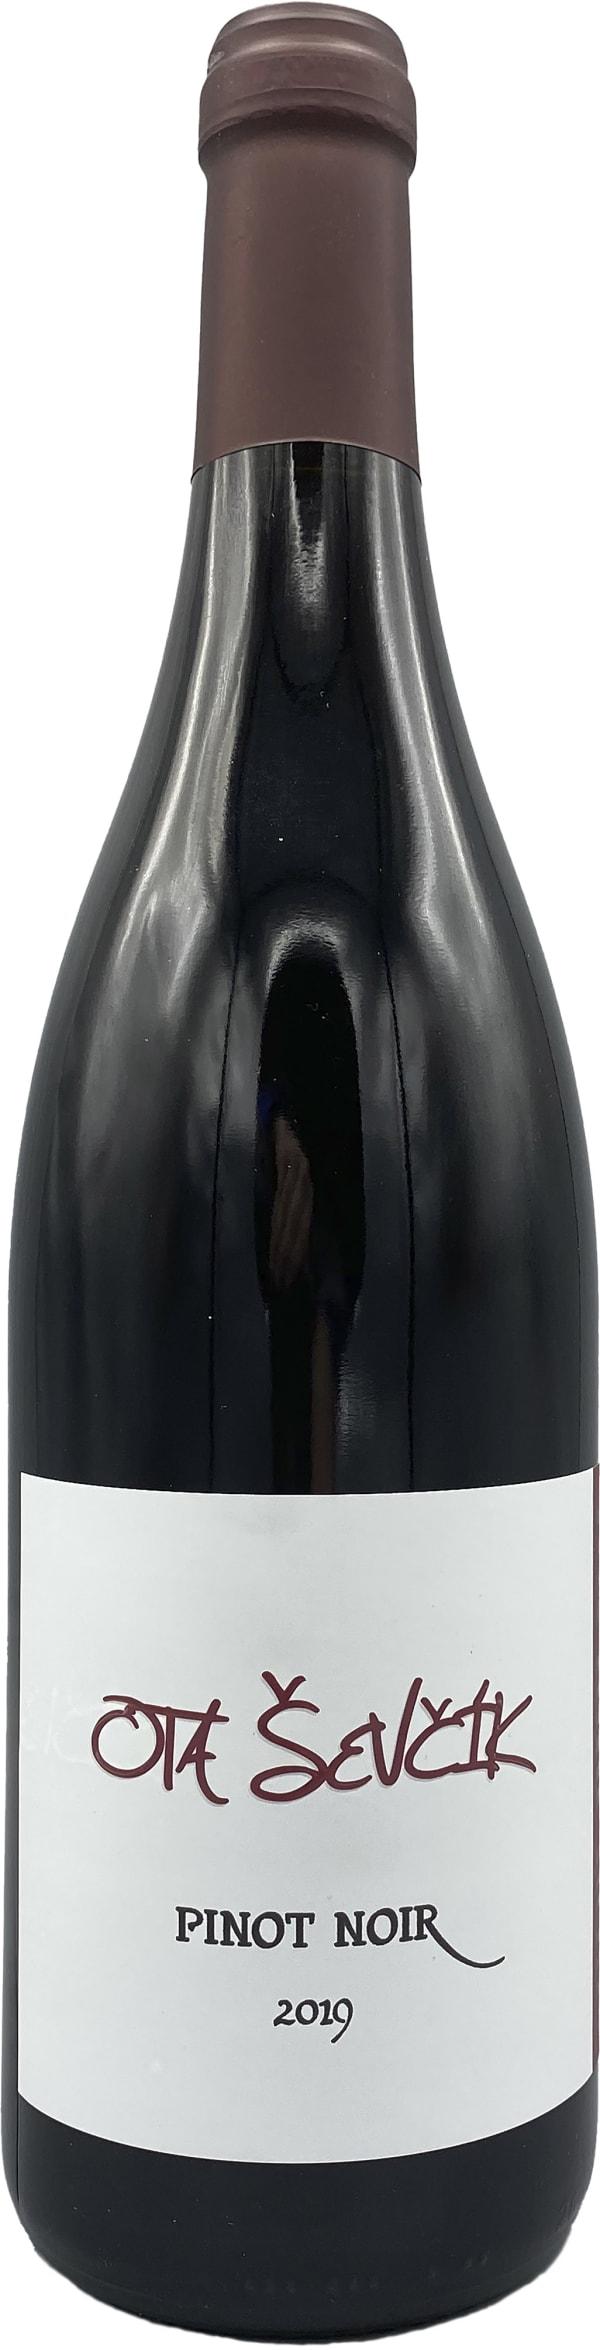 Ota Sevcik Pinot Noir 2019